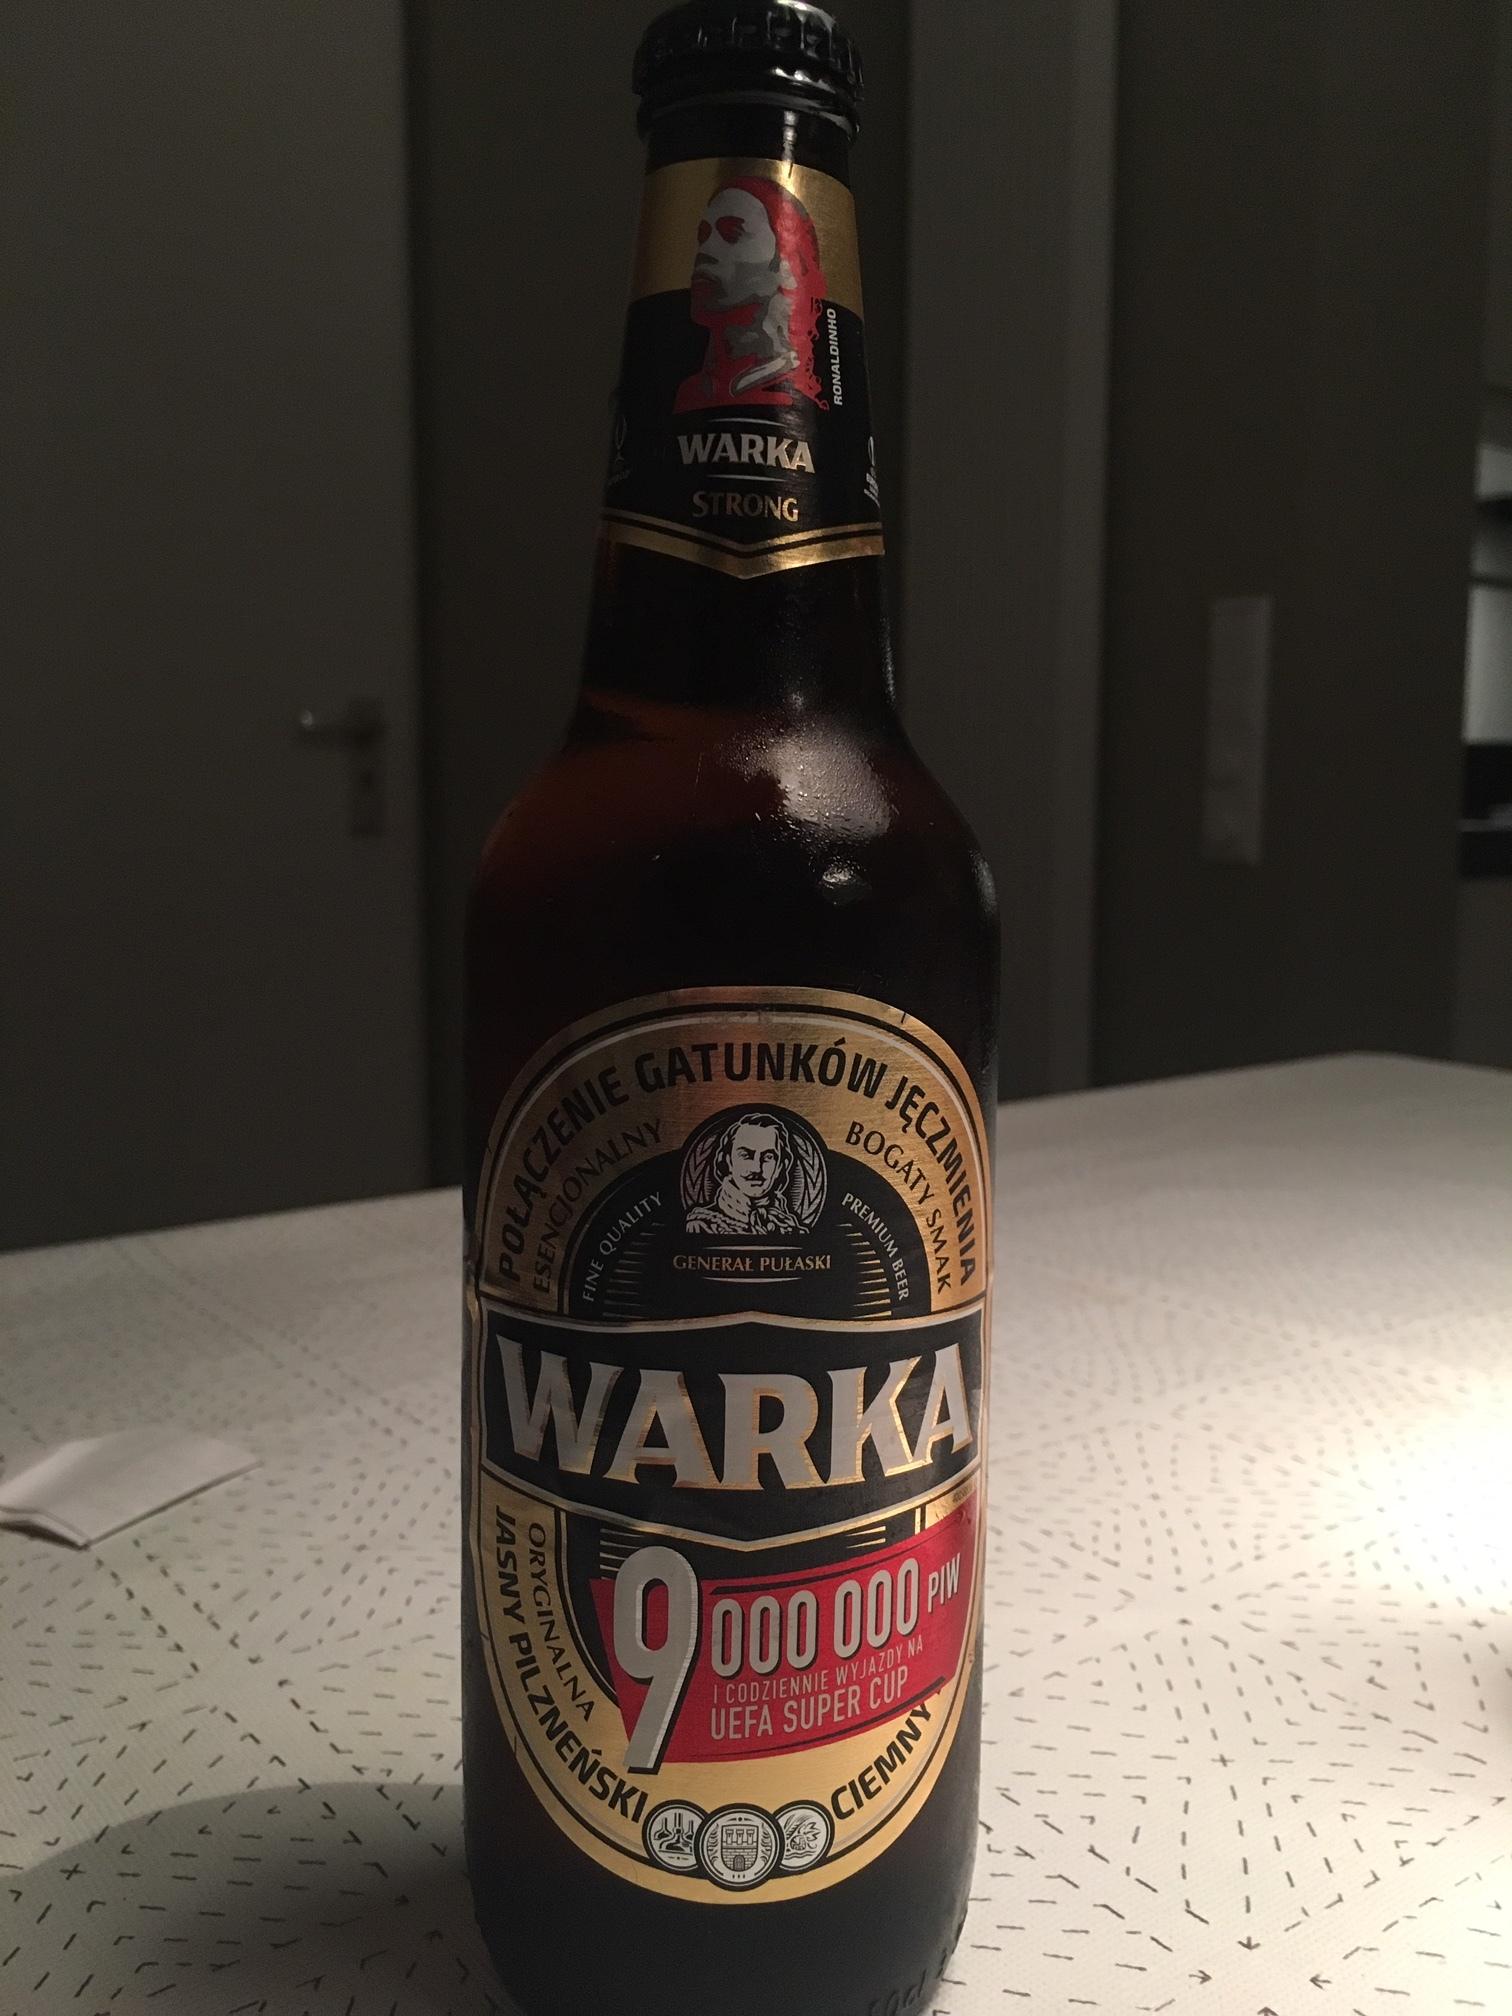 Warka premium strong